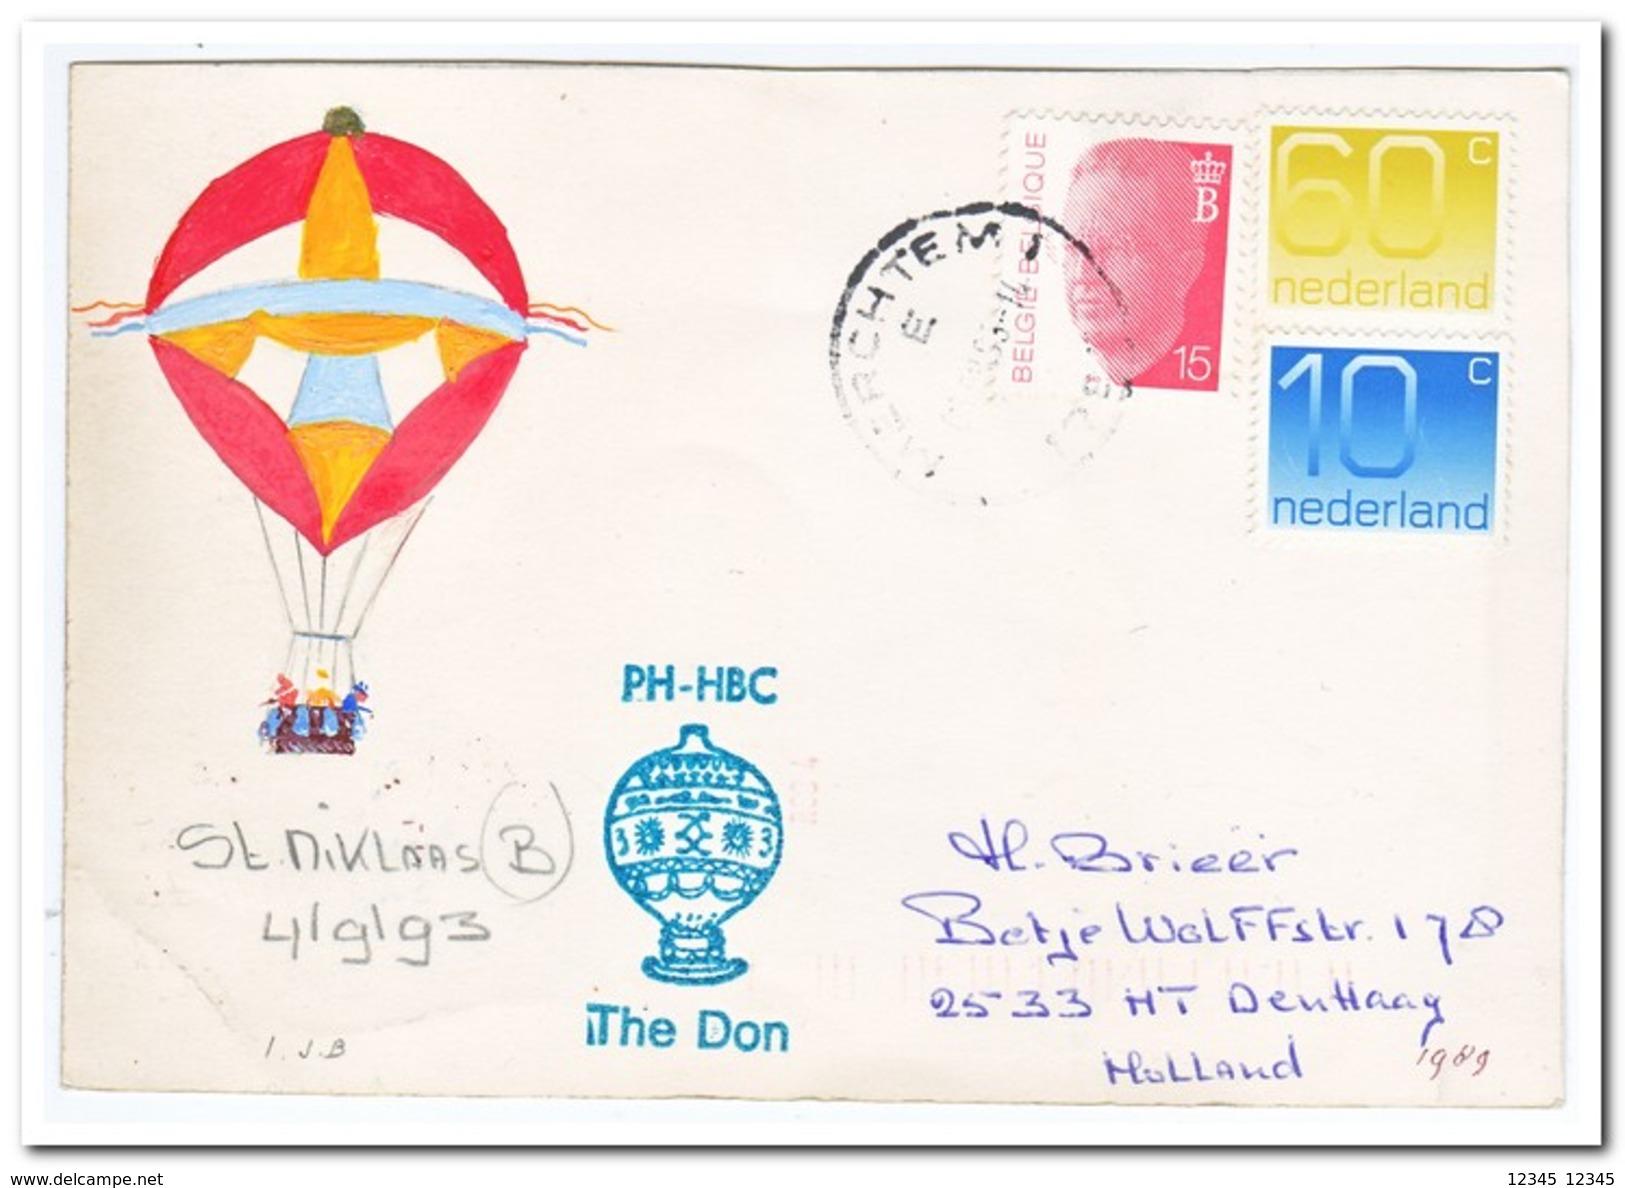 Ballonvaart 04-09-1993 St. Niklaas België - Luchtballons